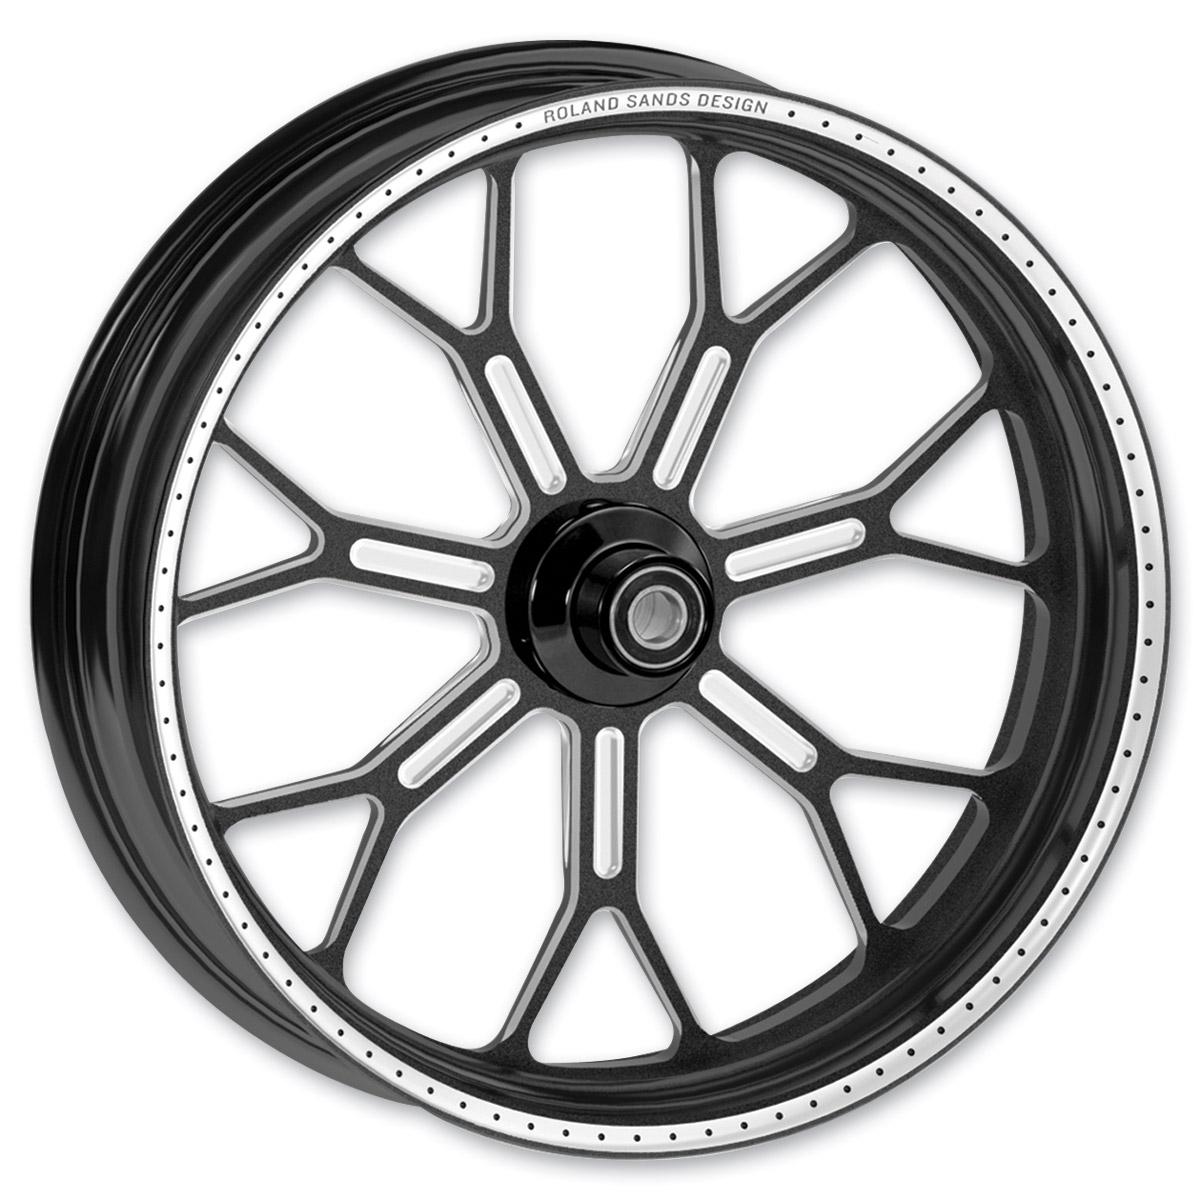 Roland Sands Design Del Mar Contrast Ops Rear Wheel, 18